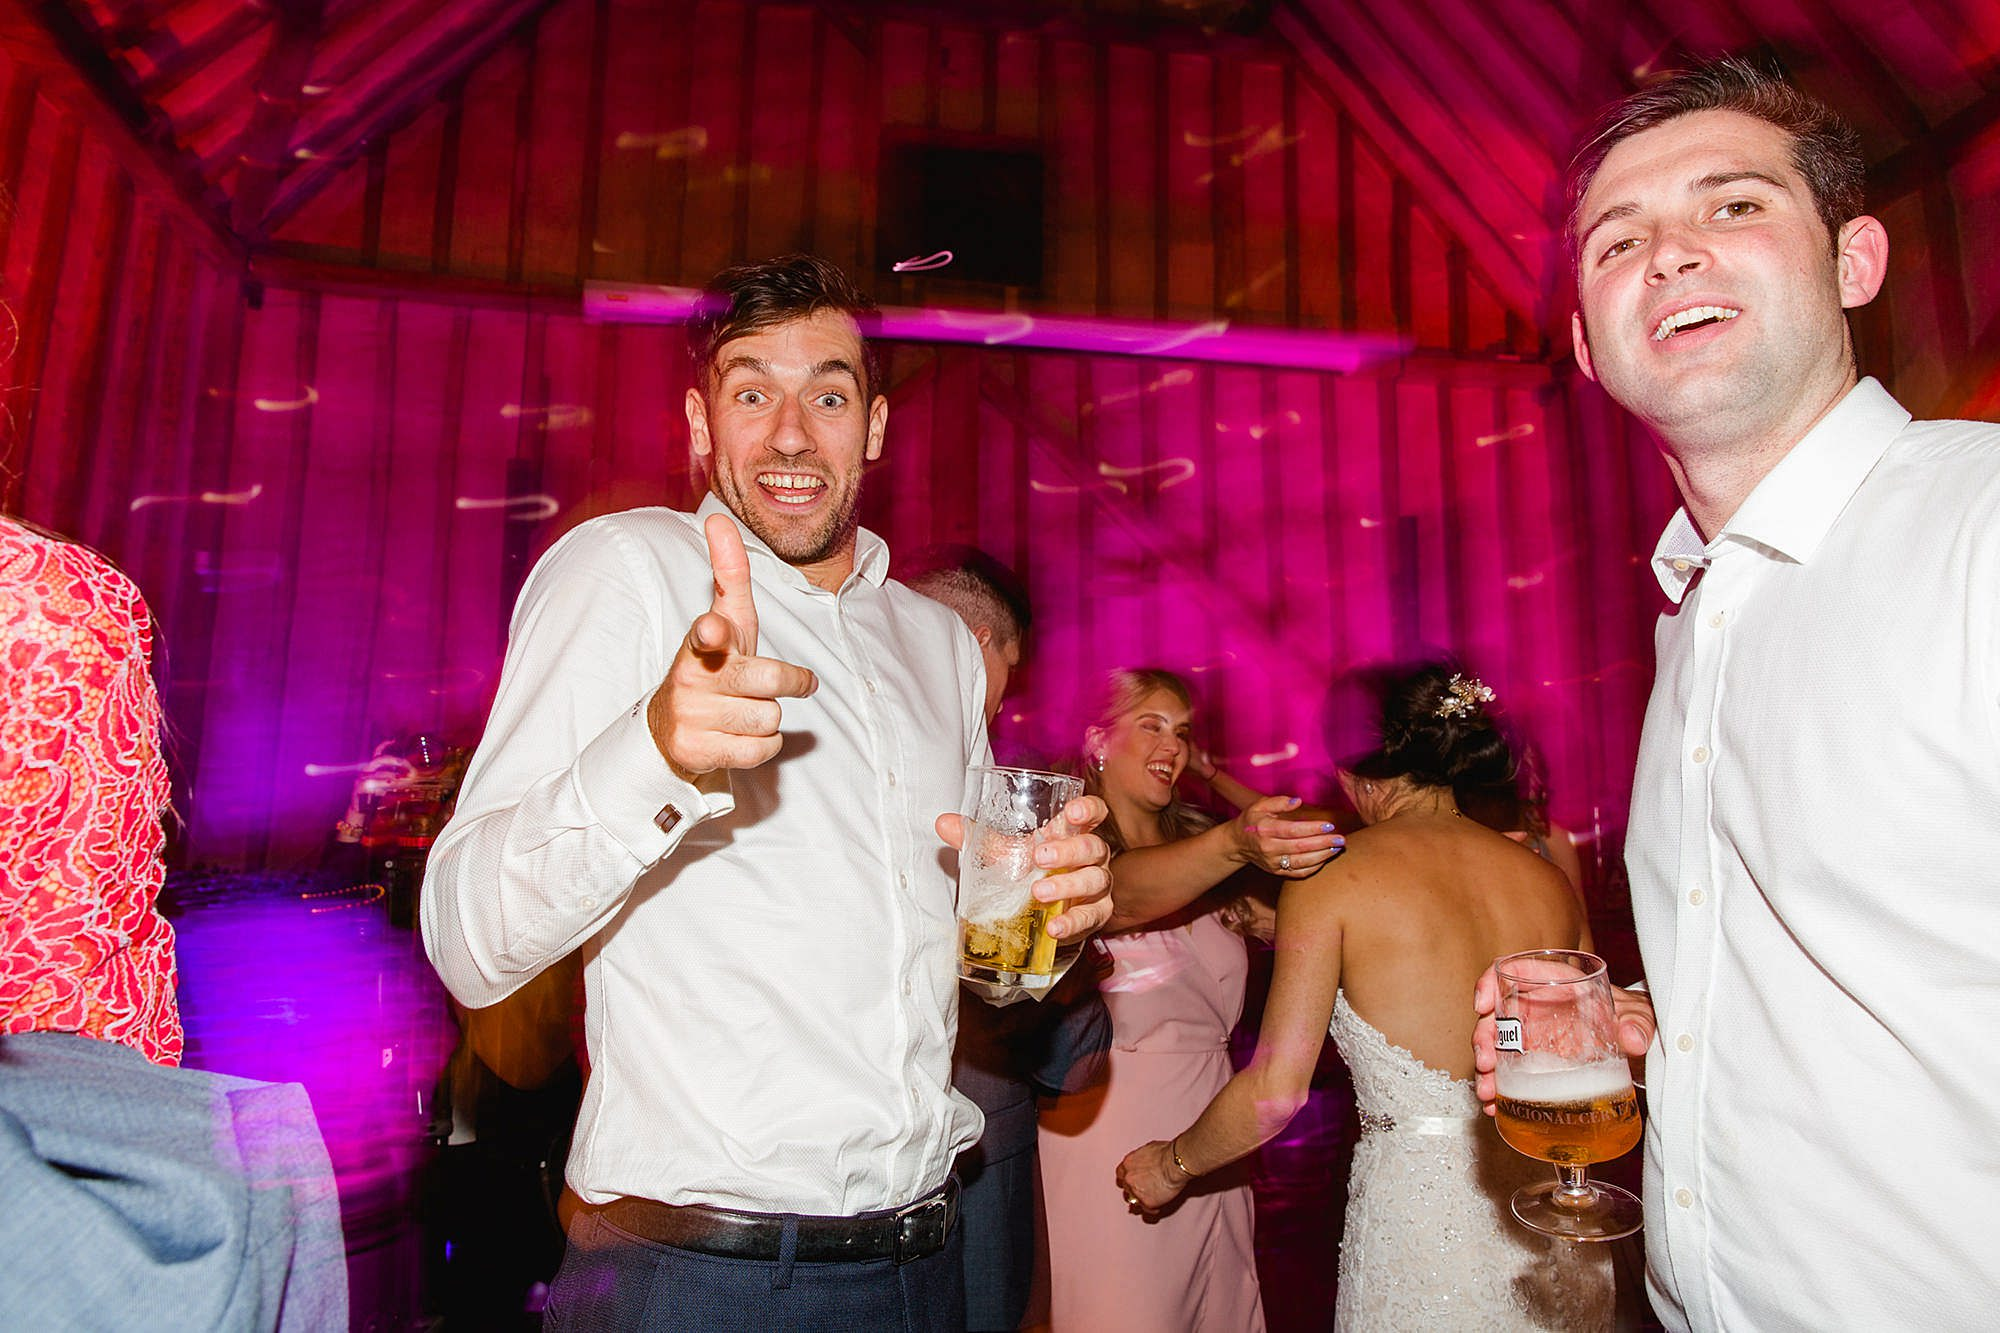 Lillibrooke Manor wedding fun guest dancing